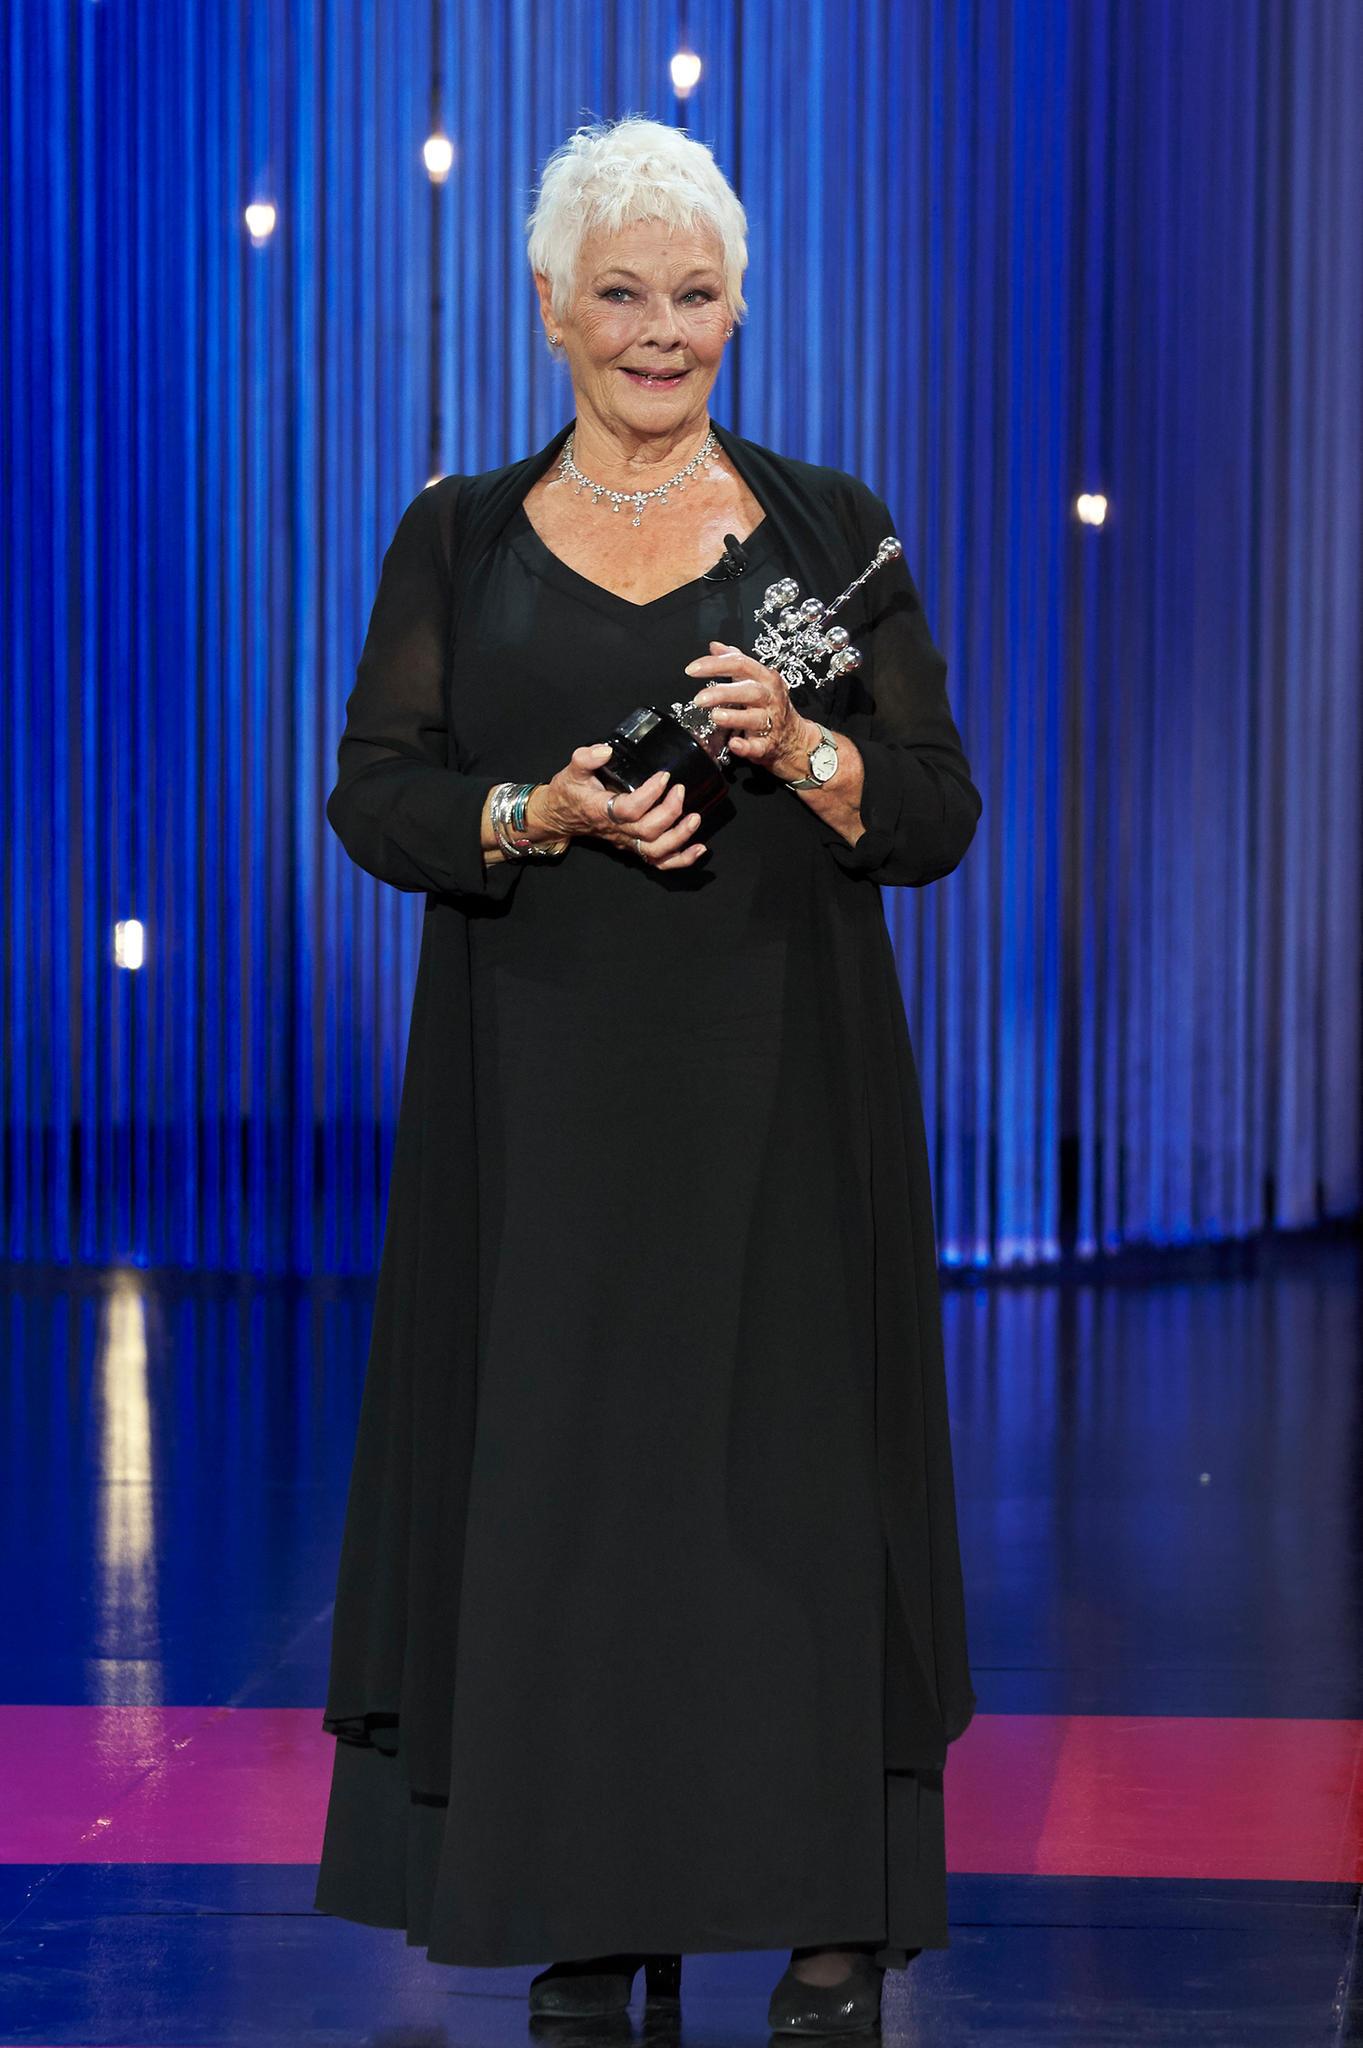 Judi Dench - Starportr